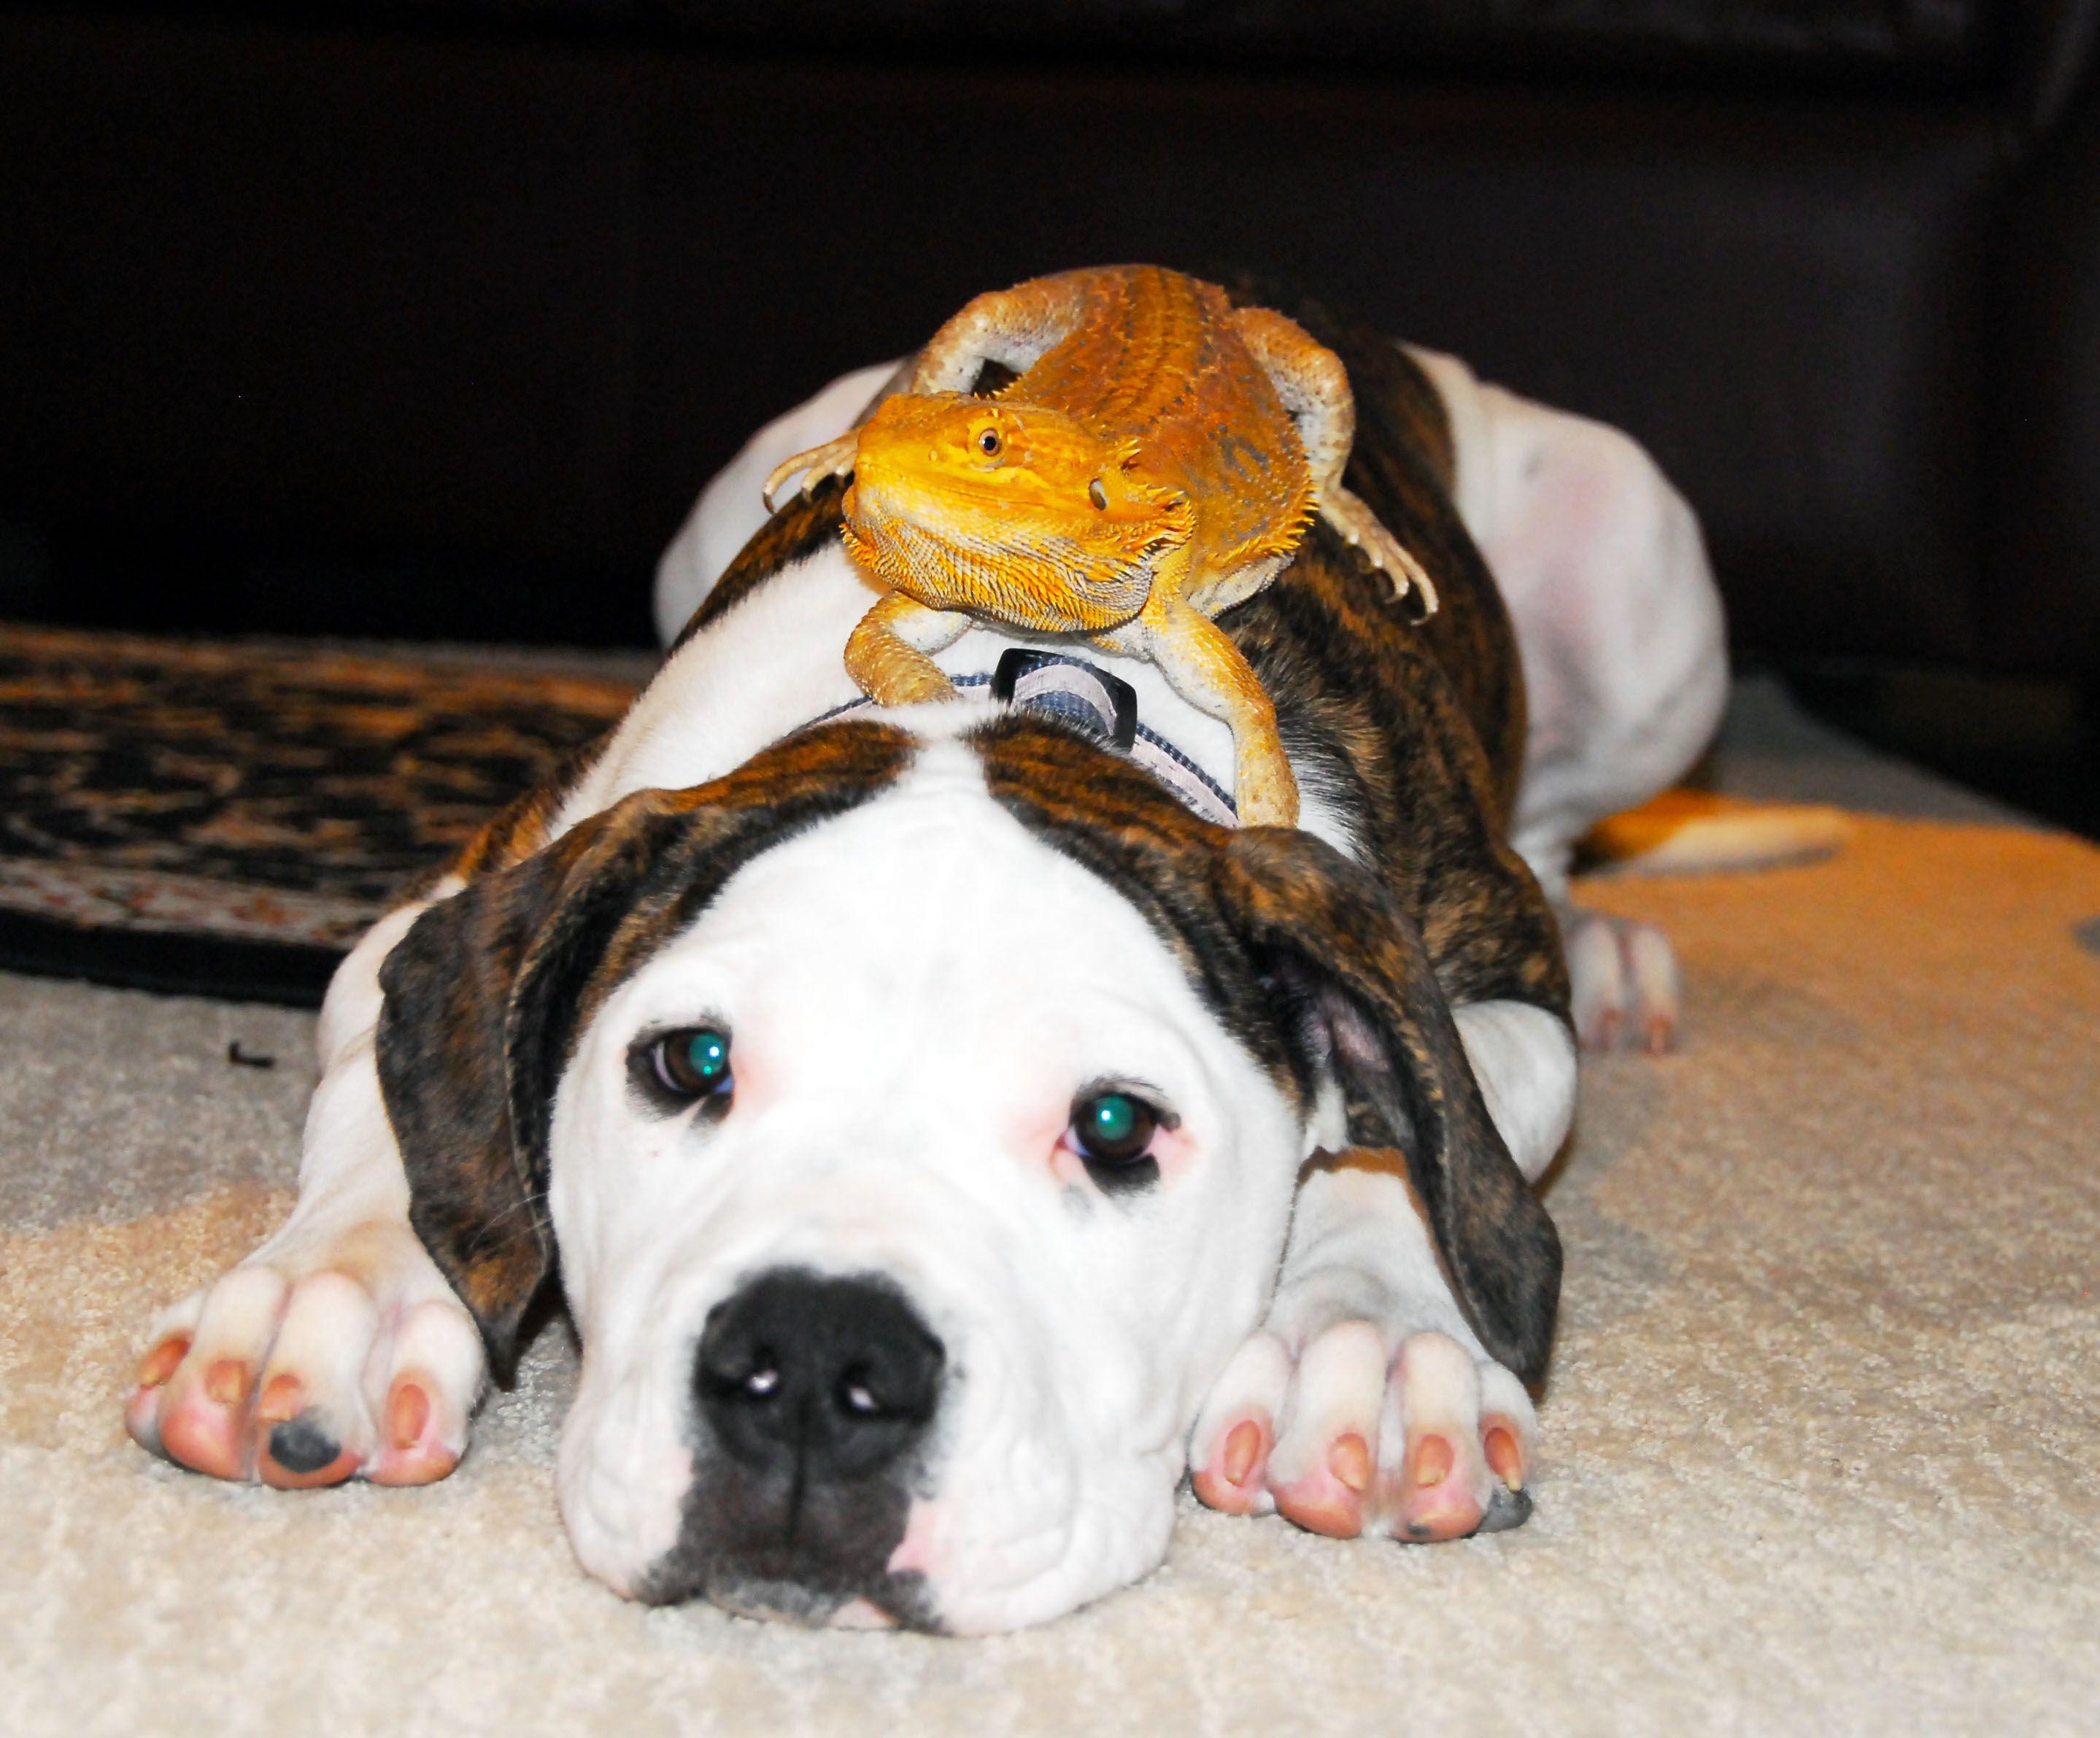 American Bulldog & Bearded Dragon